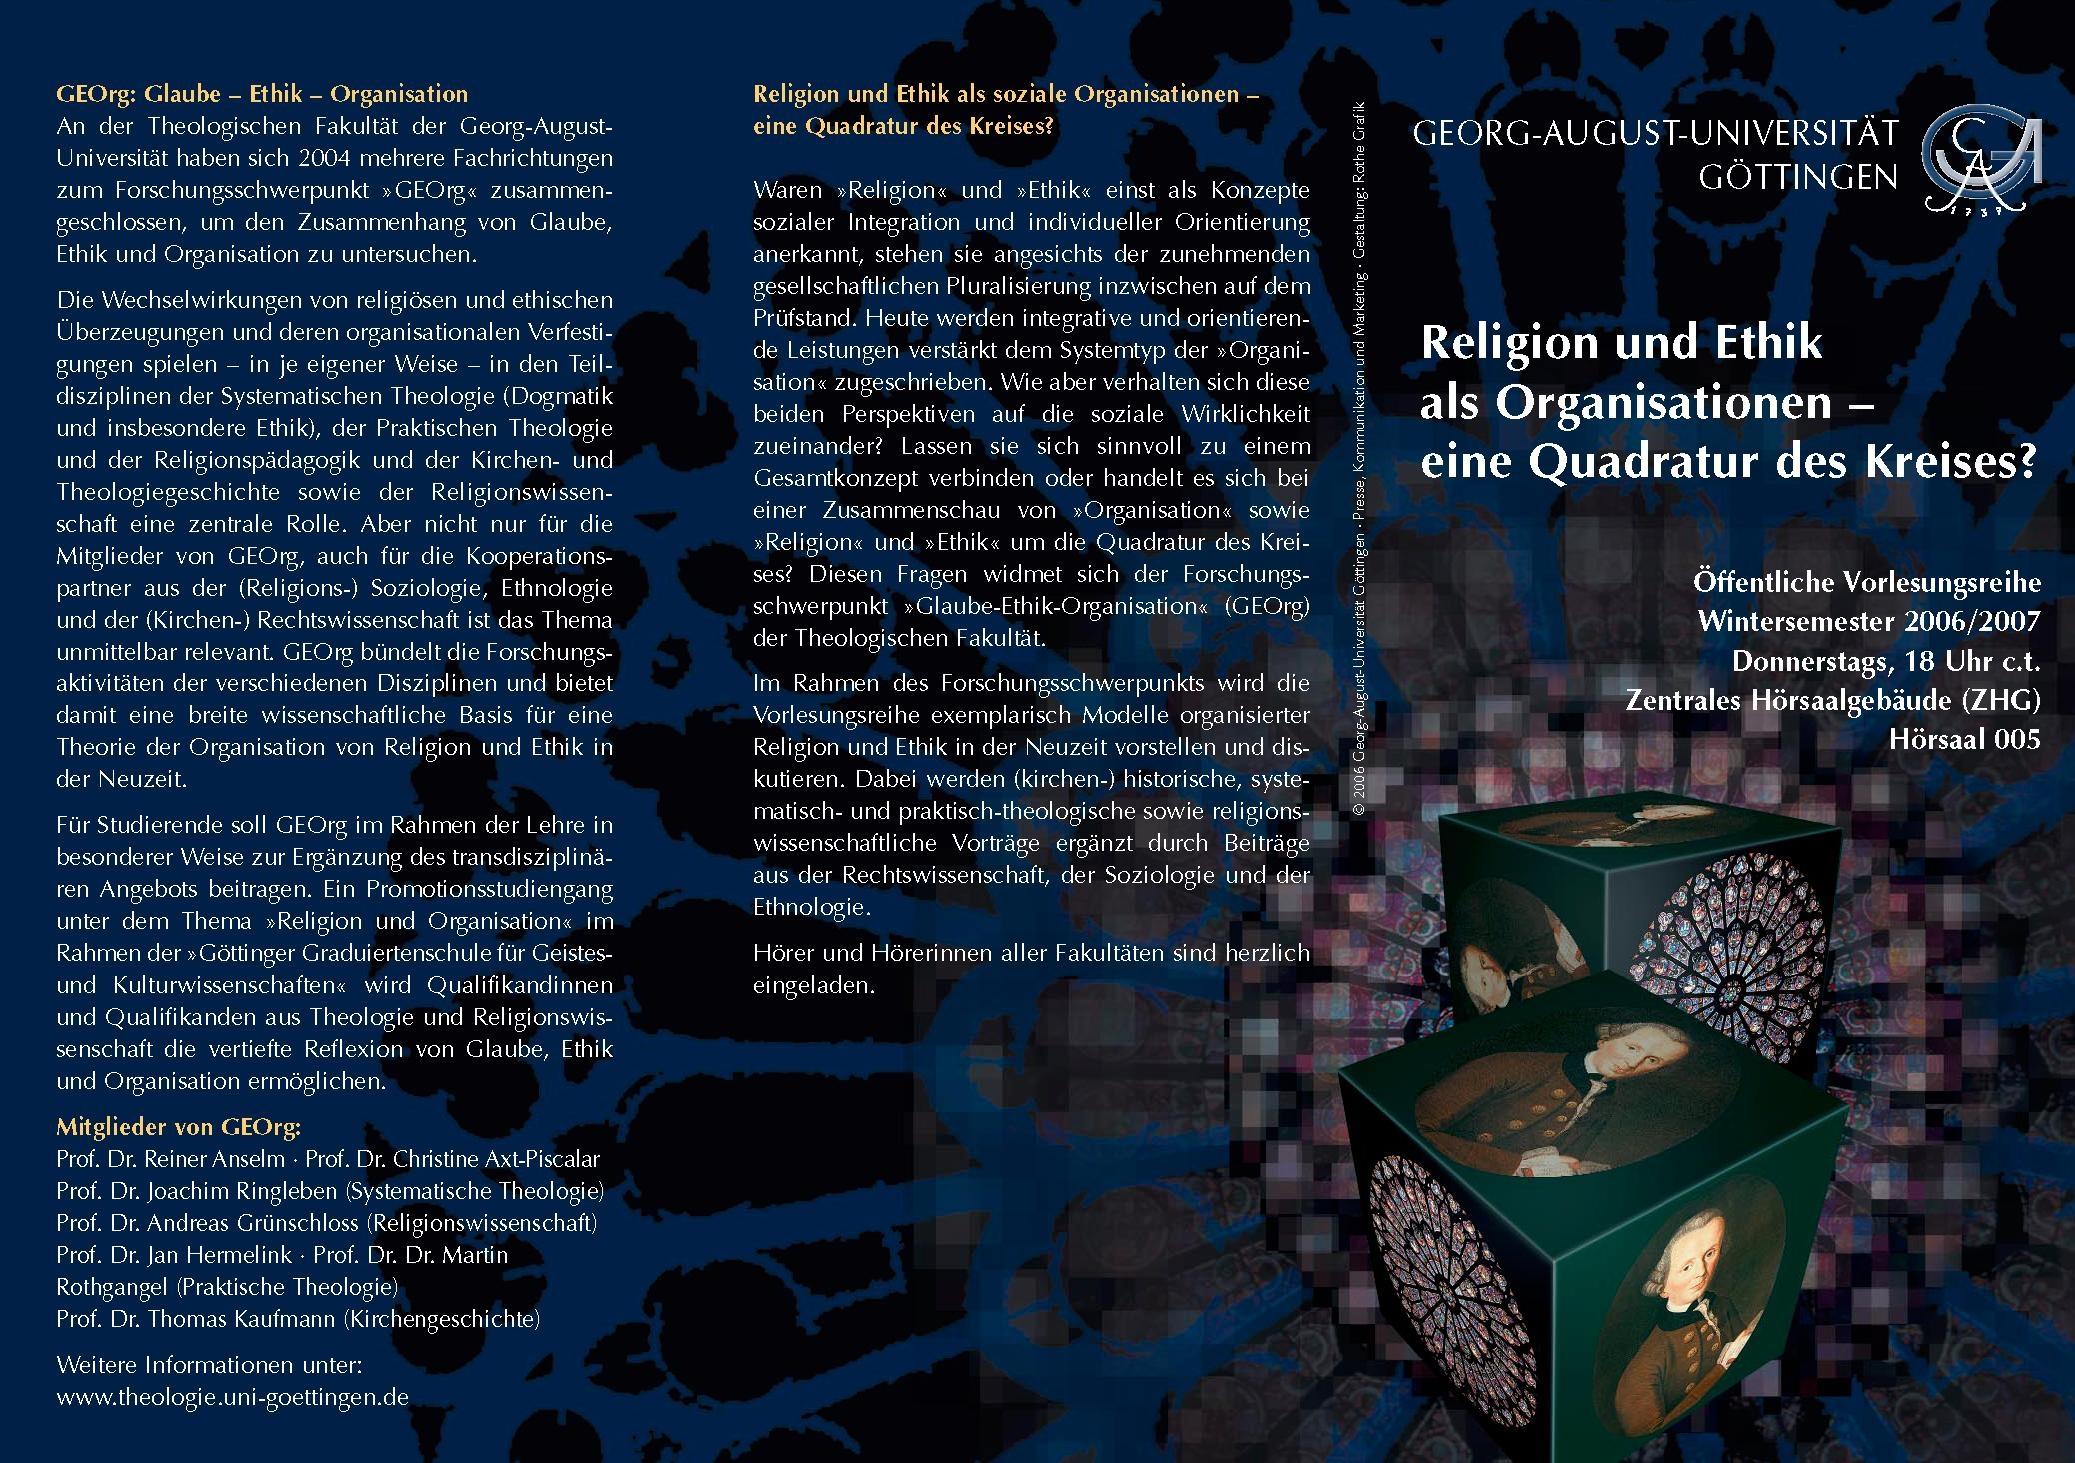 Flyers and Posters - Georg-August-Universität Göttingen